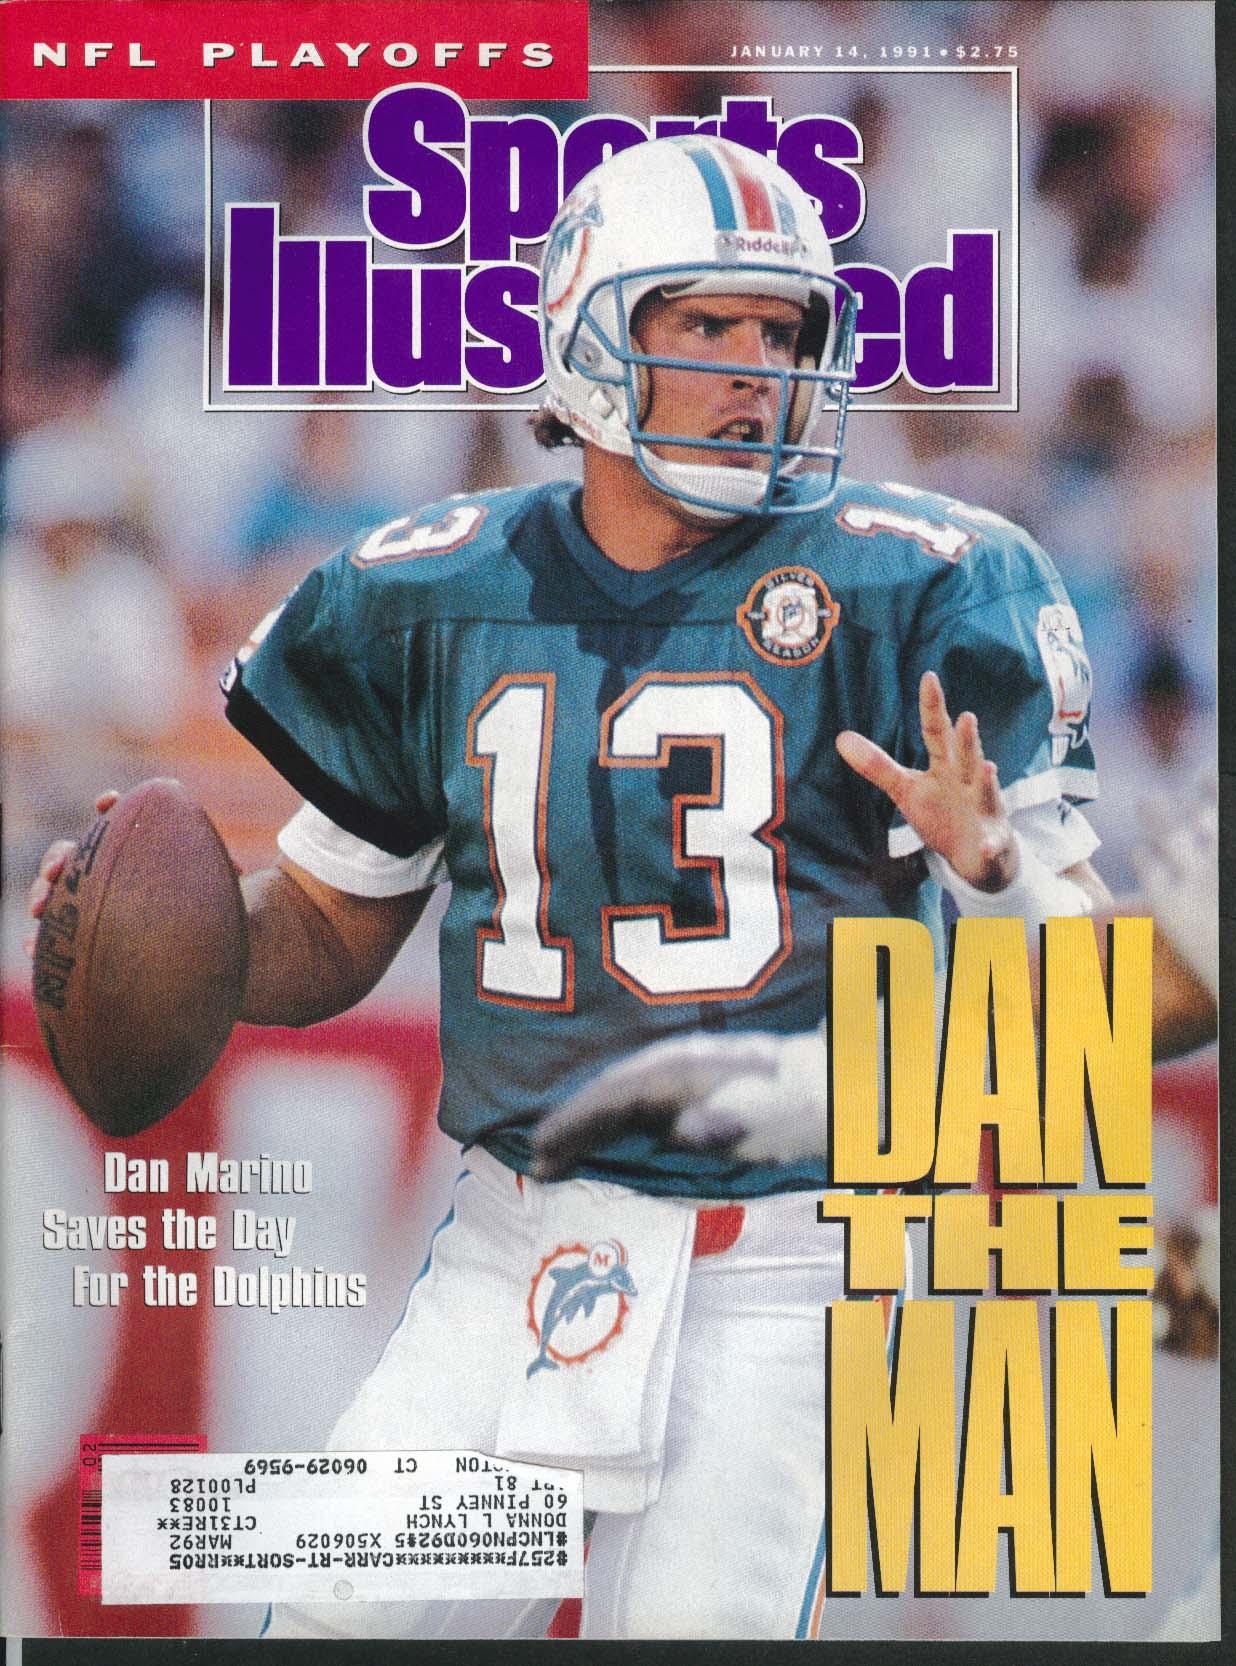 SPORTS ILLUSTRATED Dan Marino Randall Cunningham Tom Kite Ricky Pierce 1/14 1991